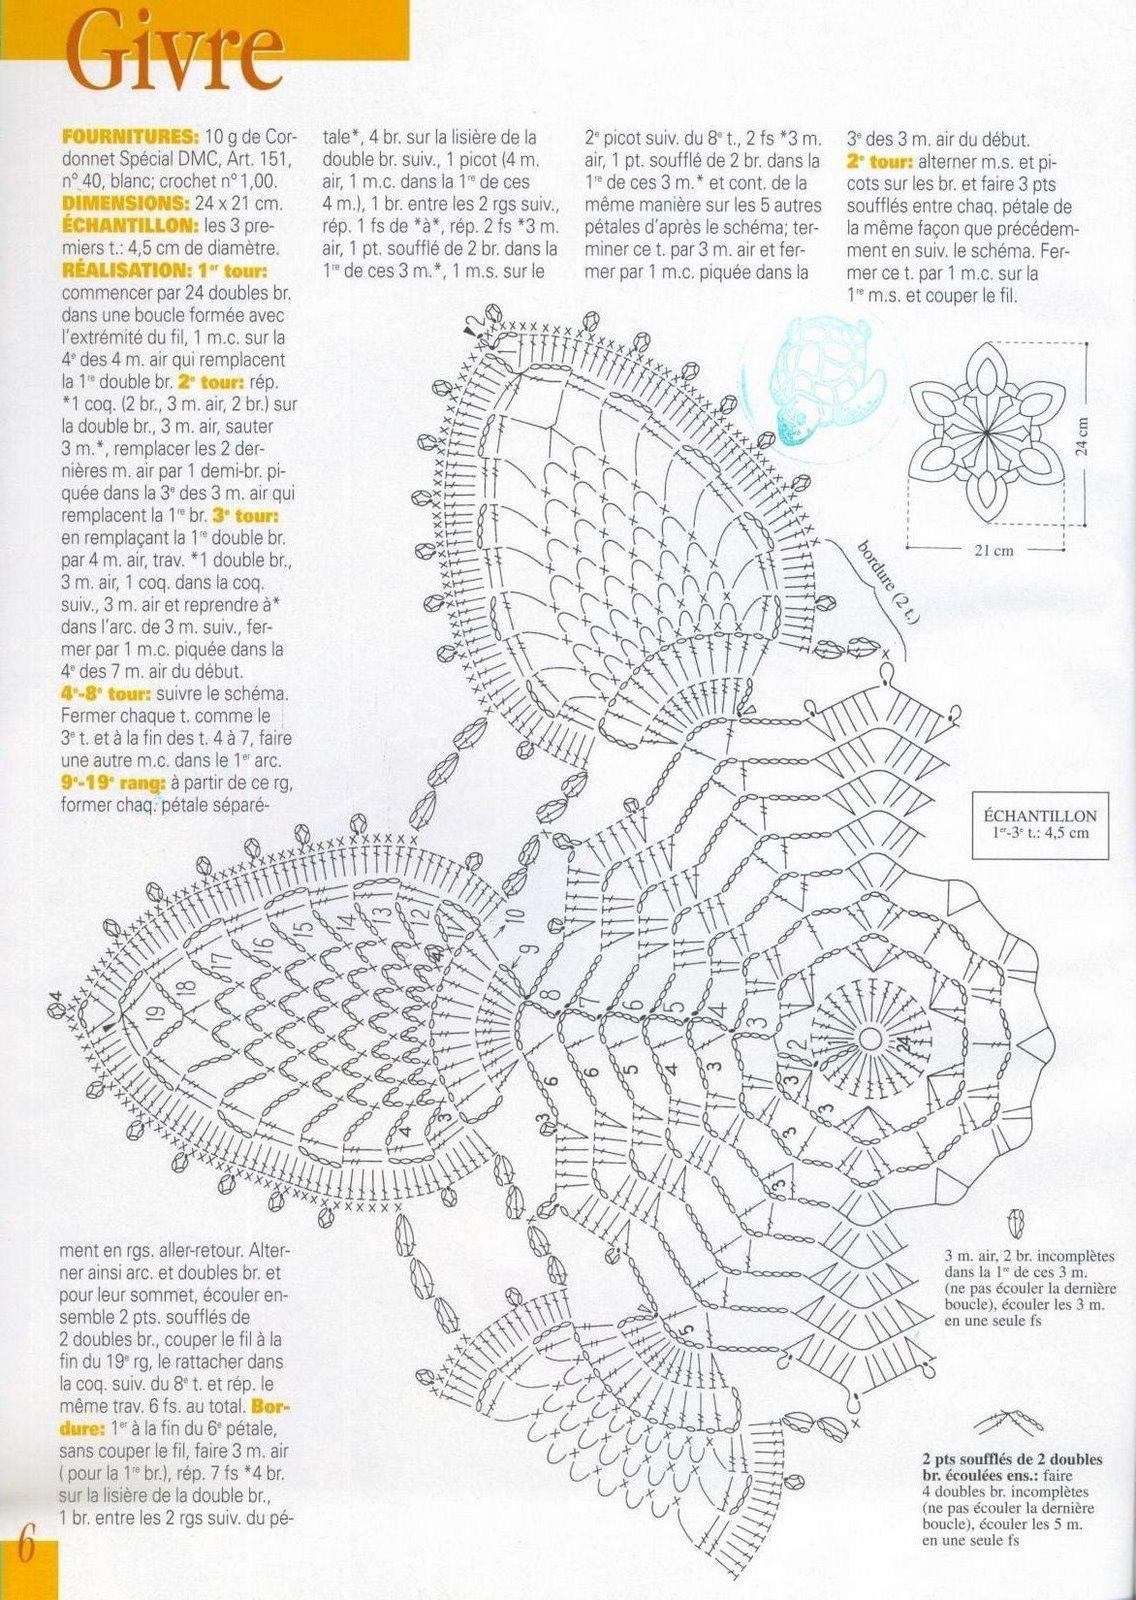 how to read crochet diagrams 220v single phase transformer wiring diagram carpetas redondas on pinterest doily